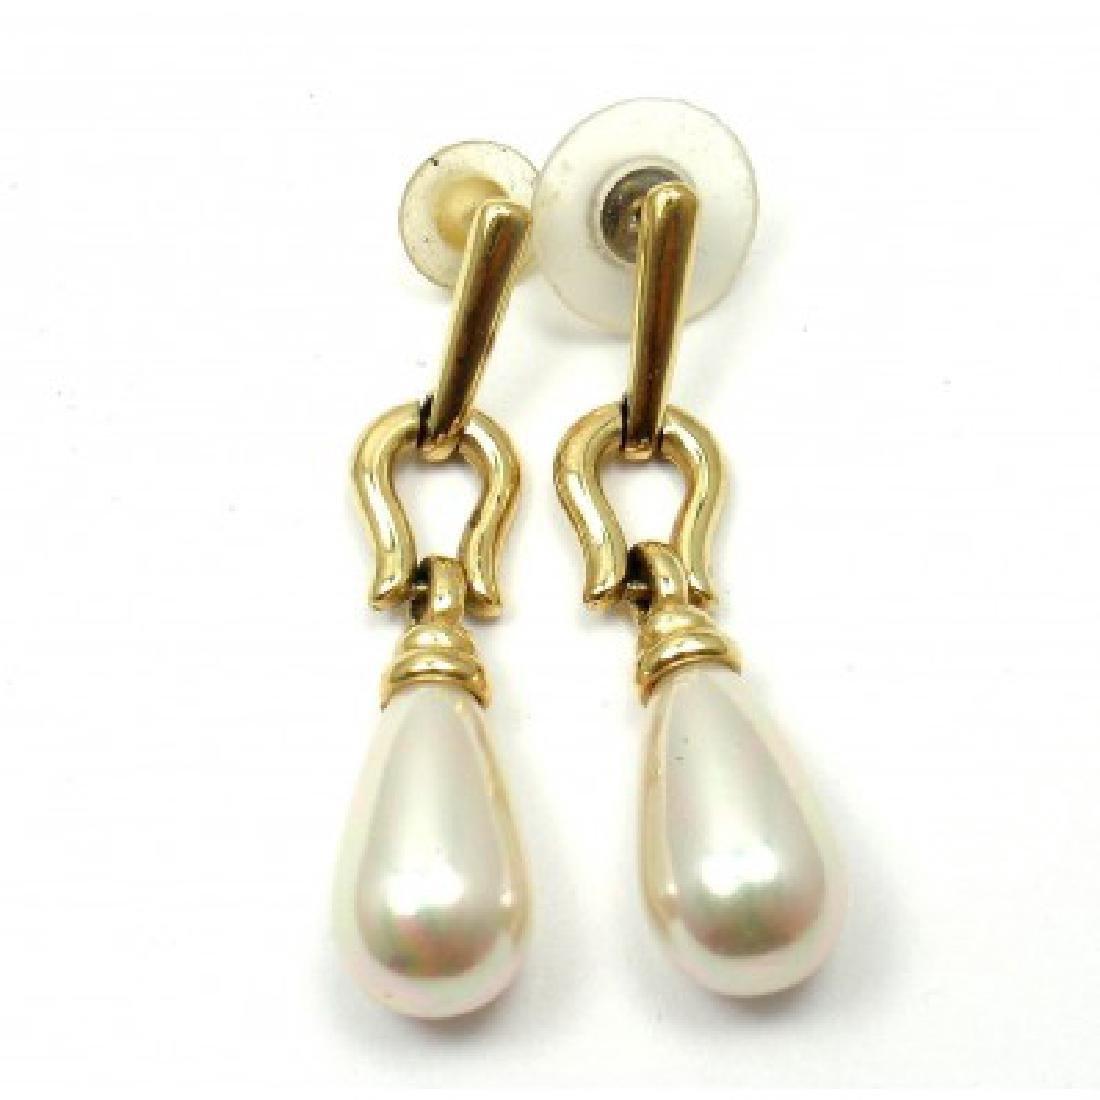 ESTATE YELLOW GOLD PEARL DROP EARRINGS - 3